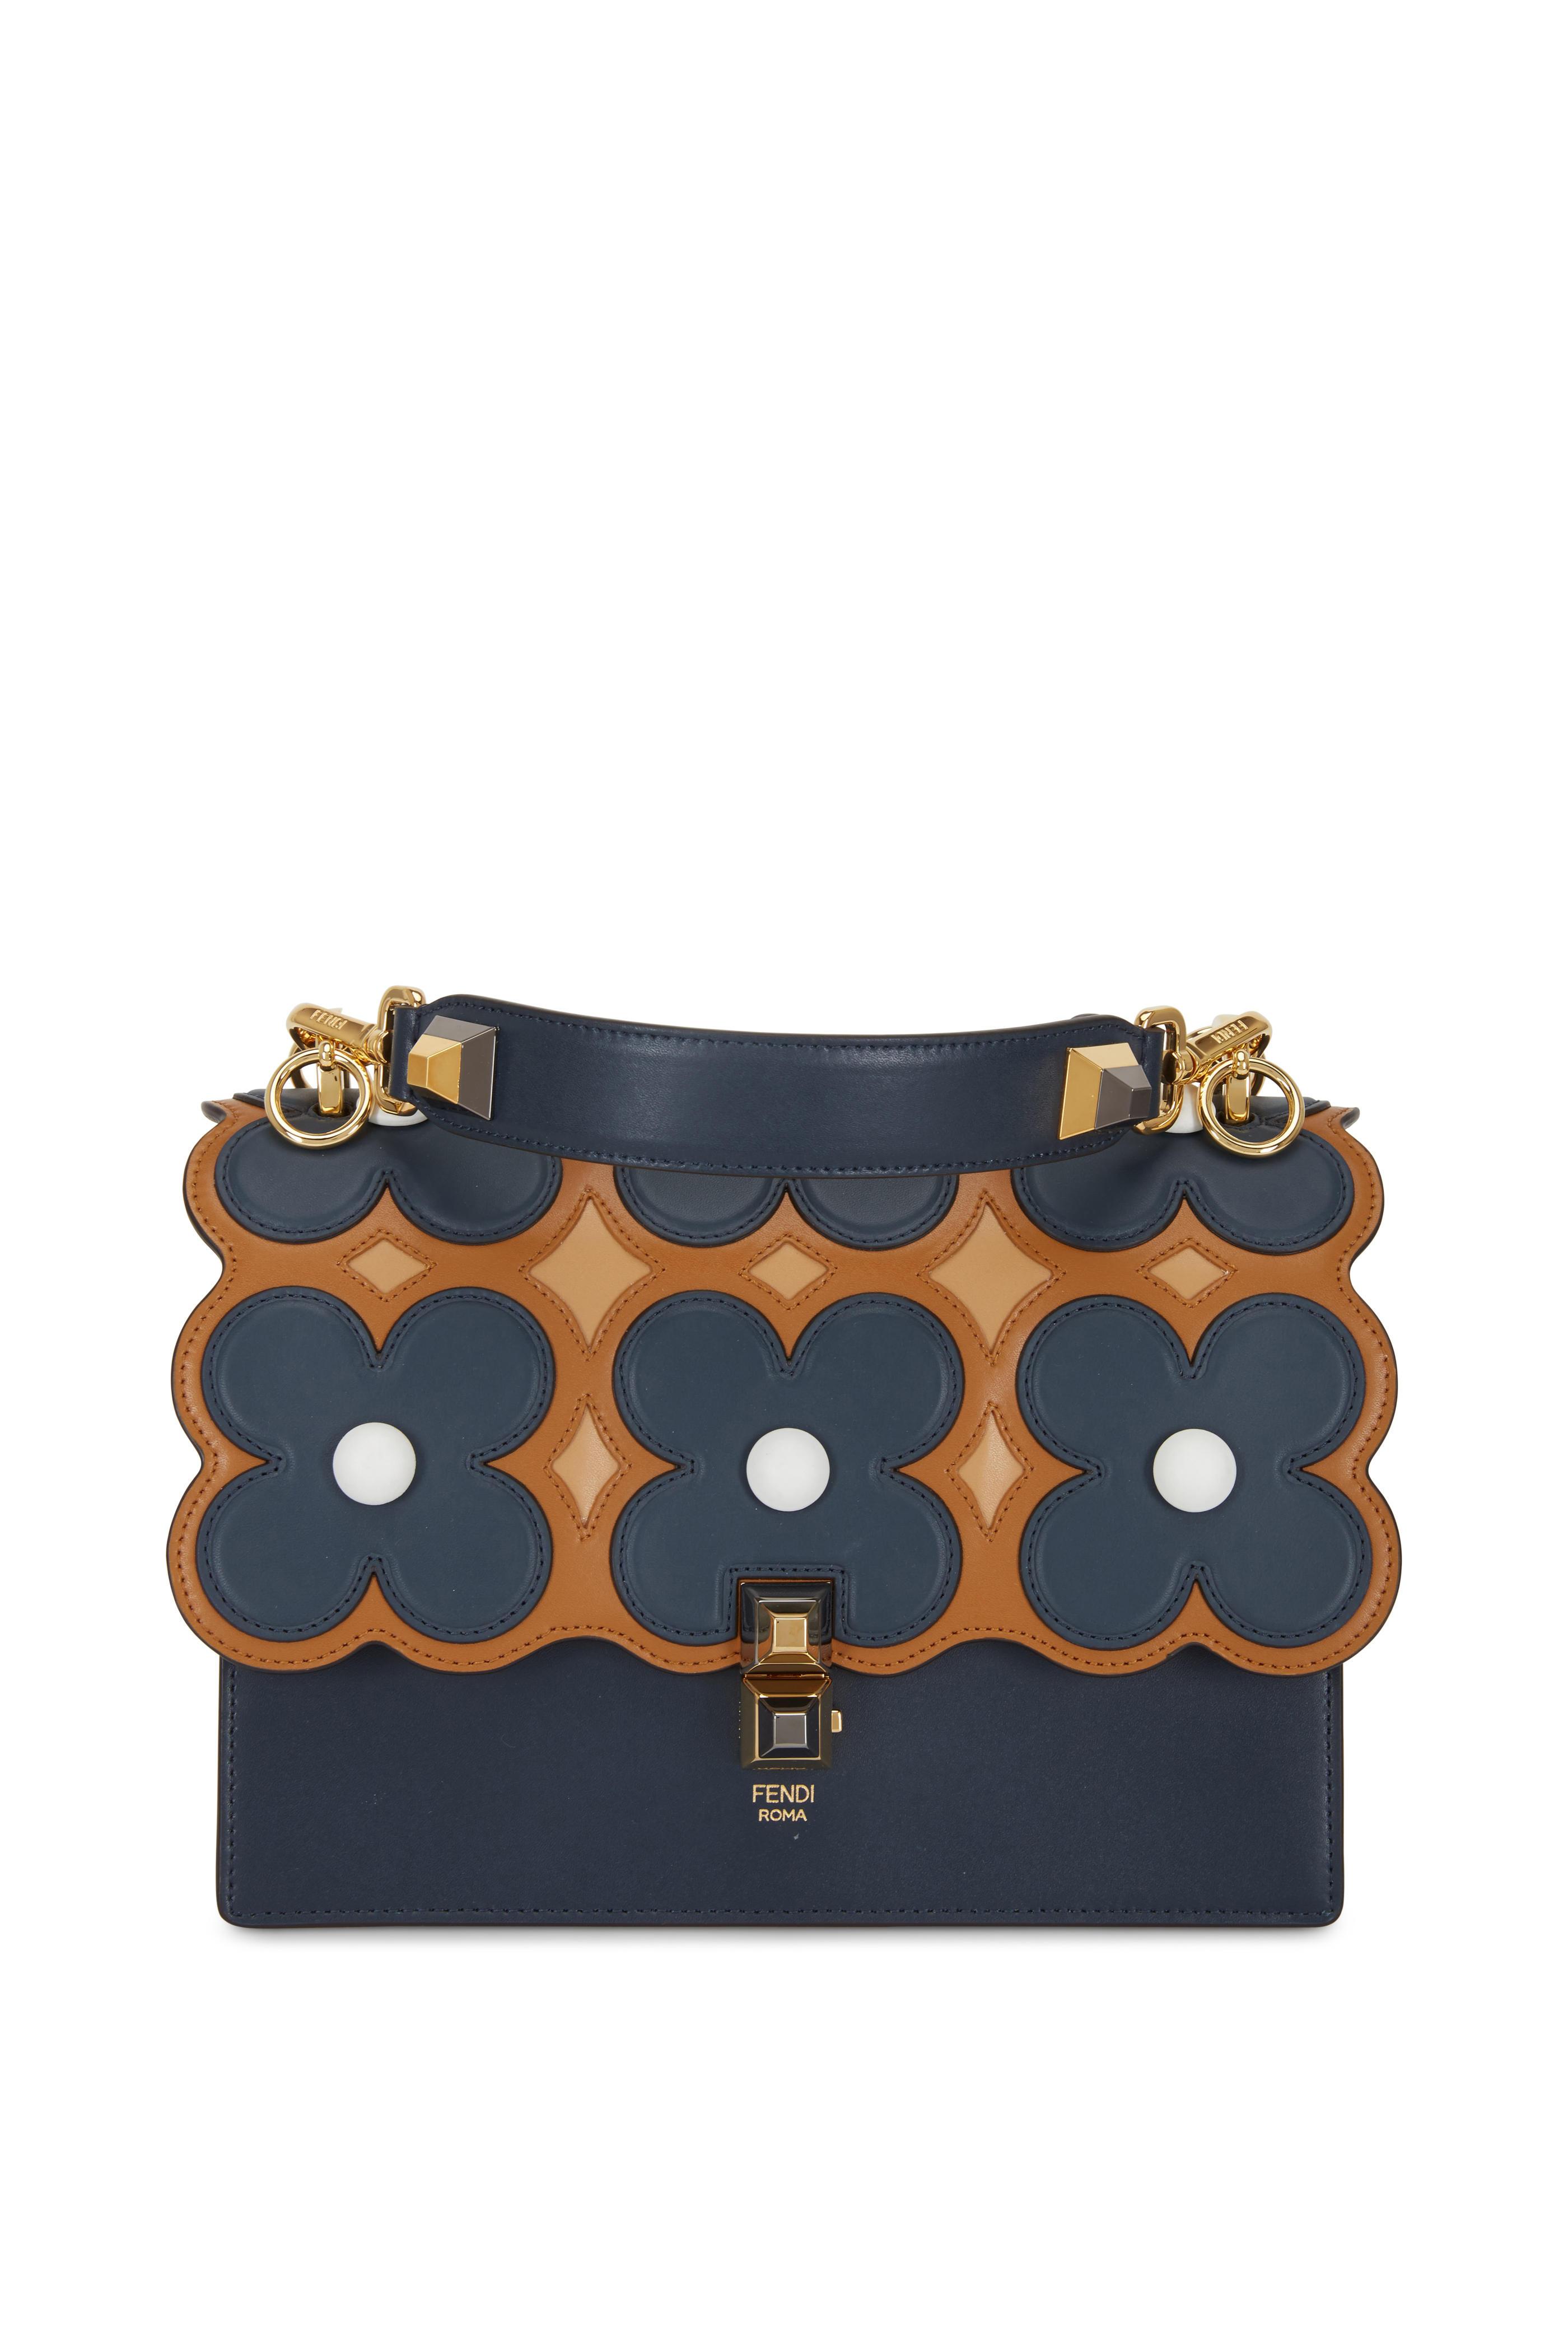 a2c20b44876 Fendi - Kan I Navy Blue   Caramel Floral Scalloped Bag   Mitchell Stores